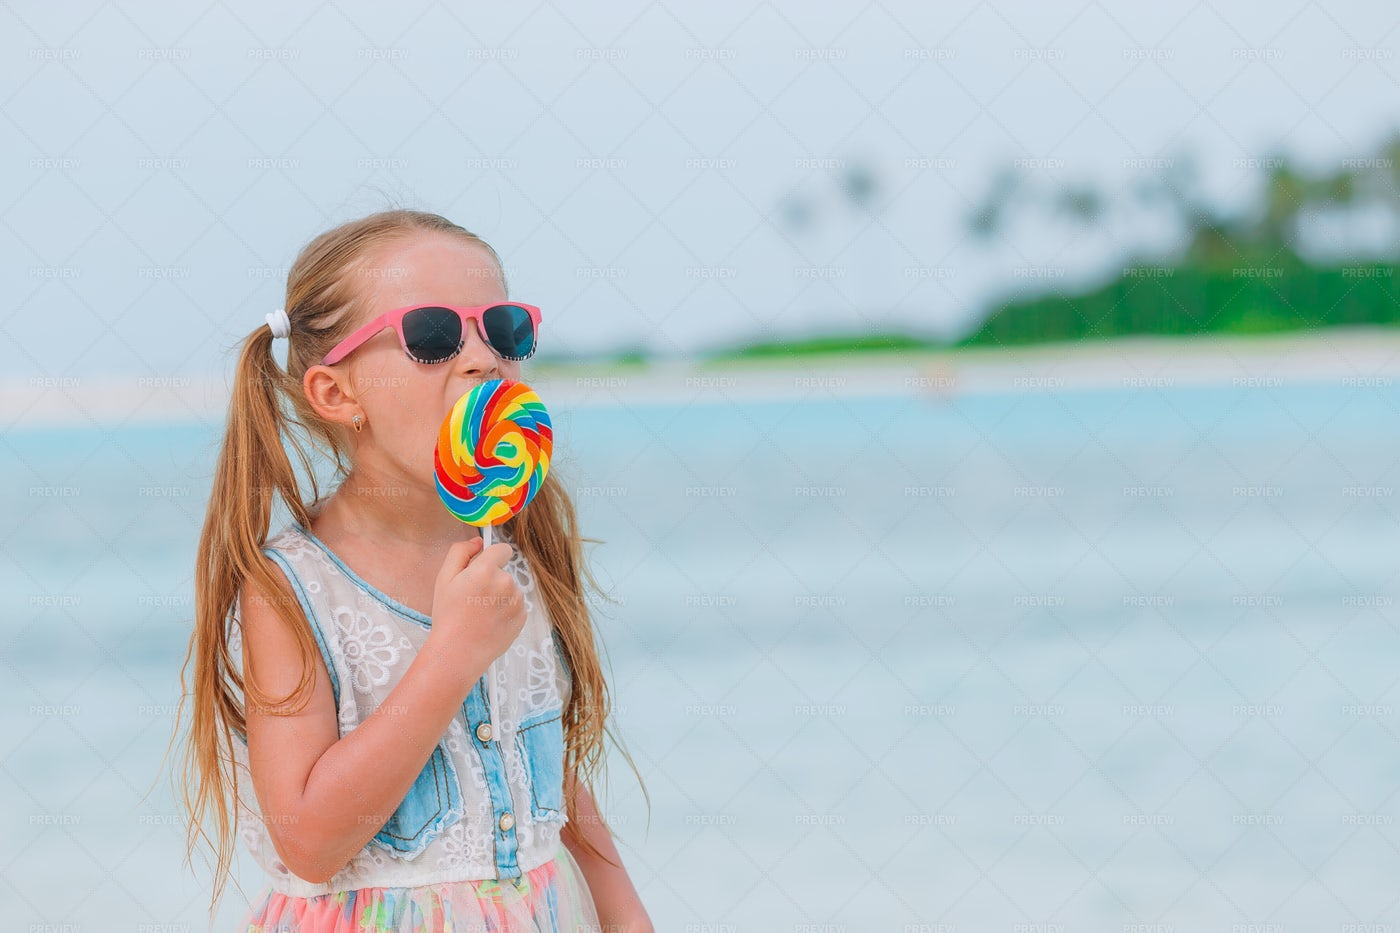 Little Girl With A Lollipop: Stock Photos